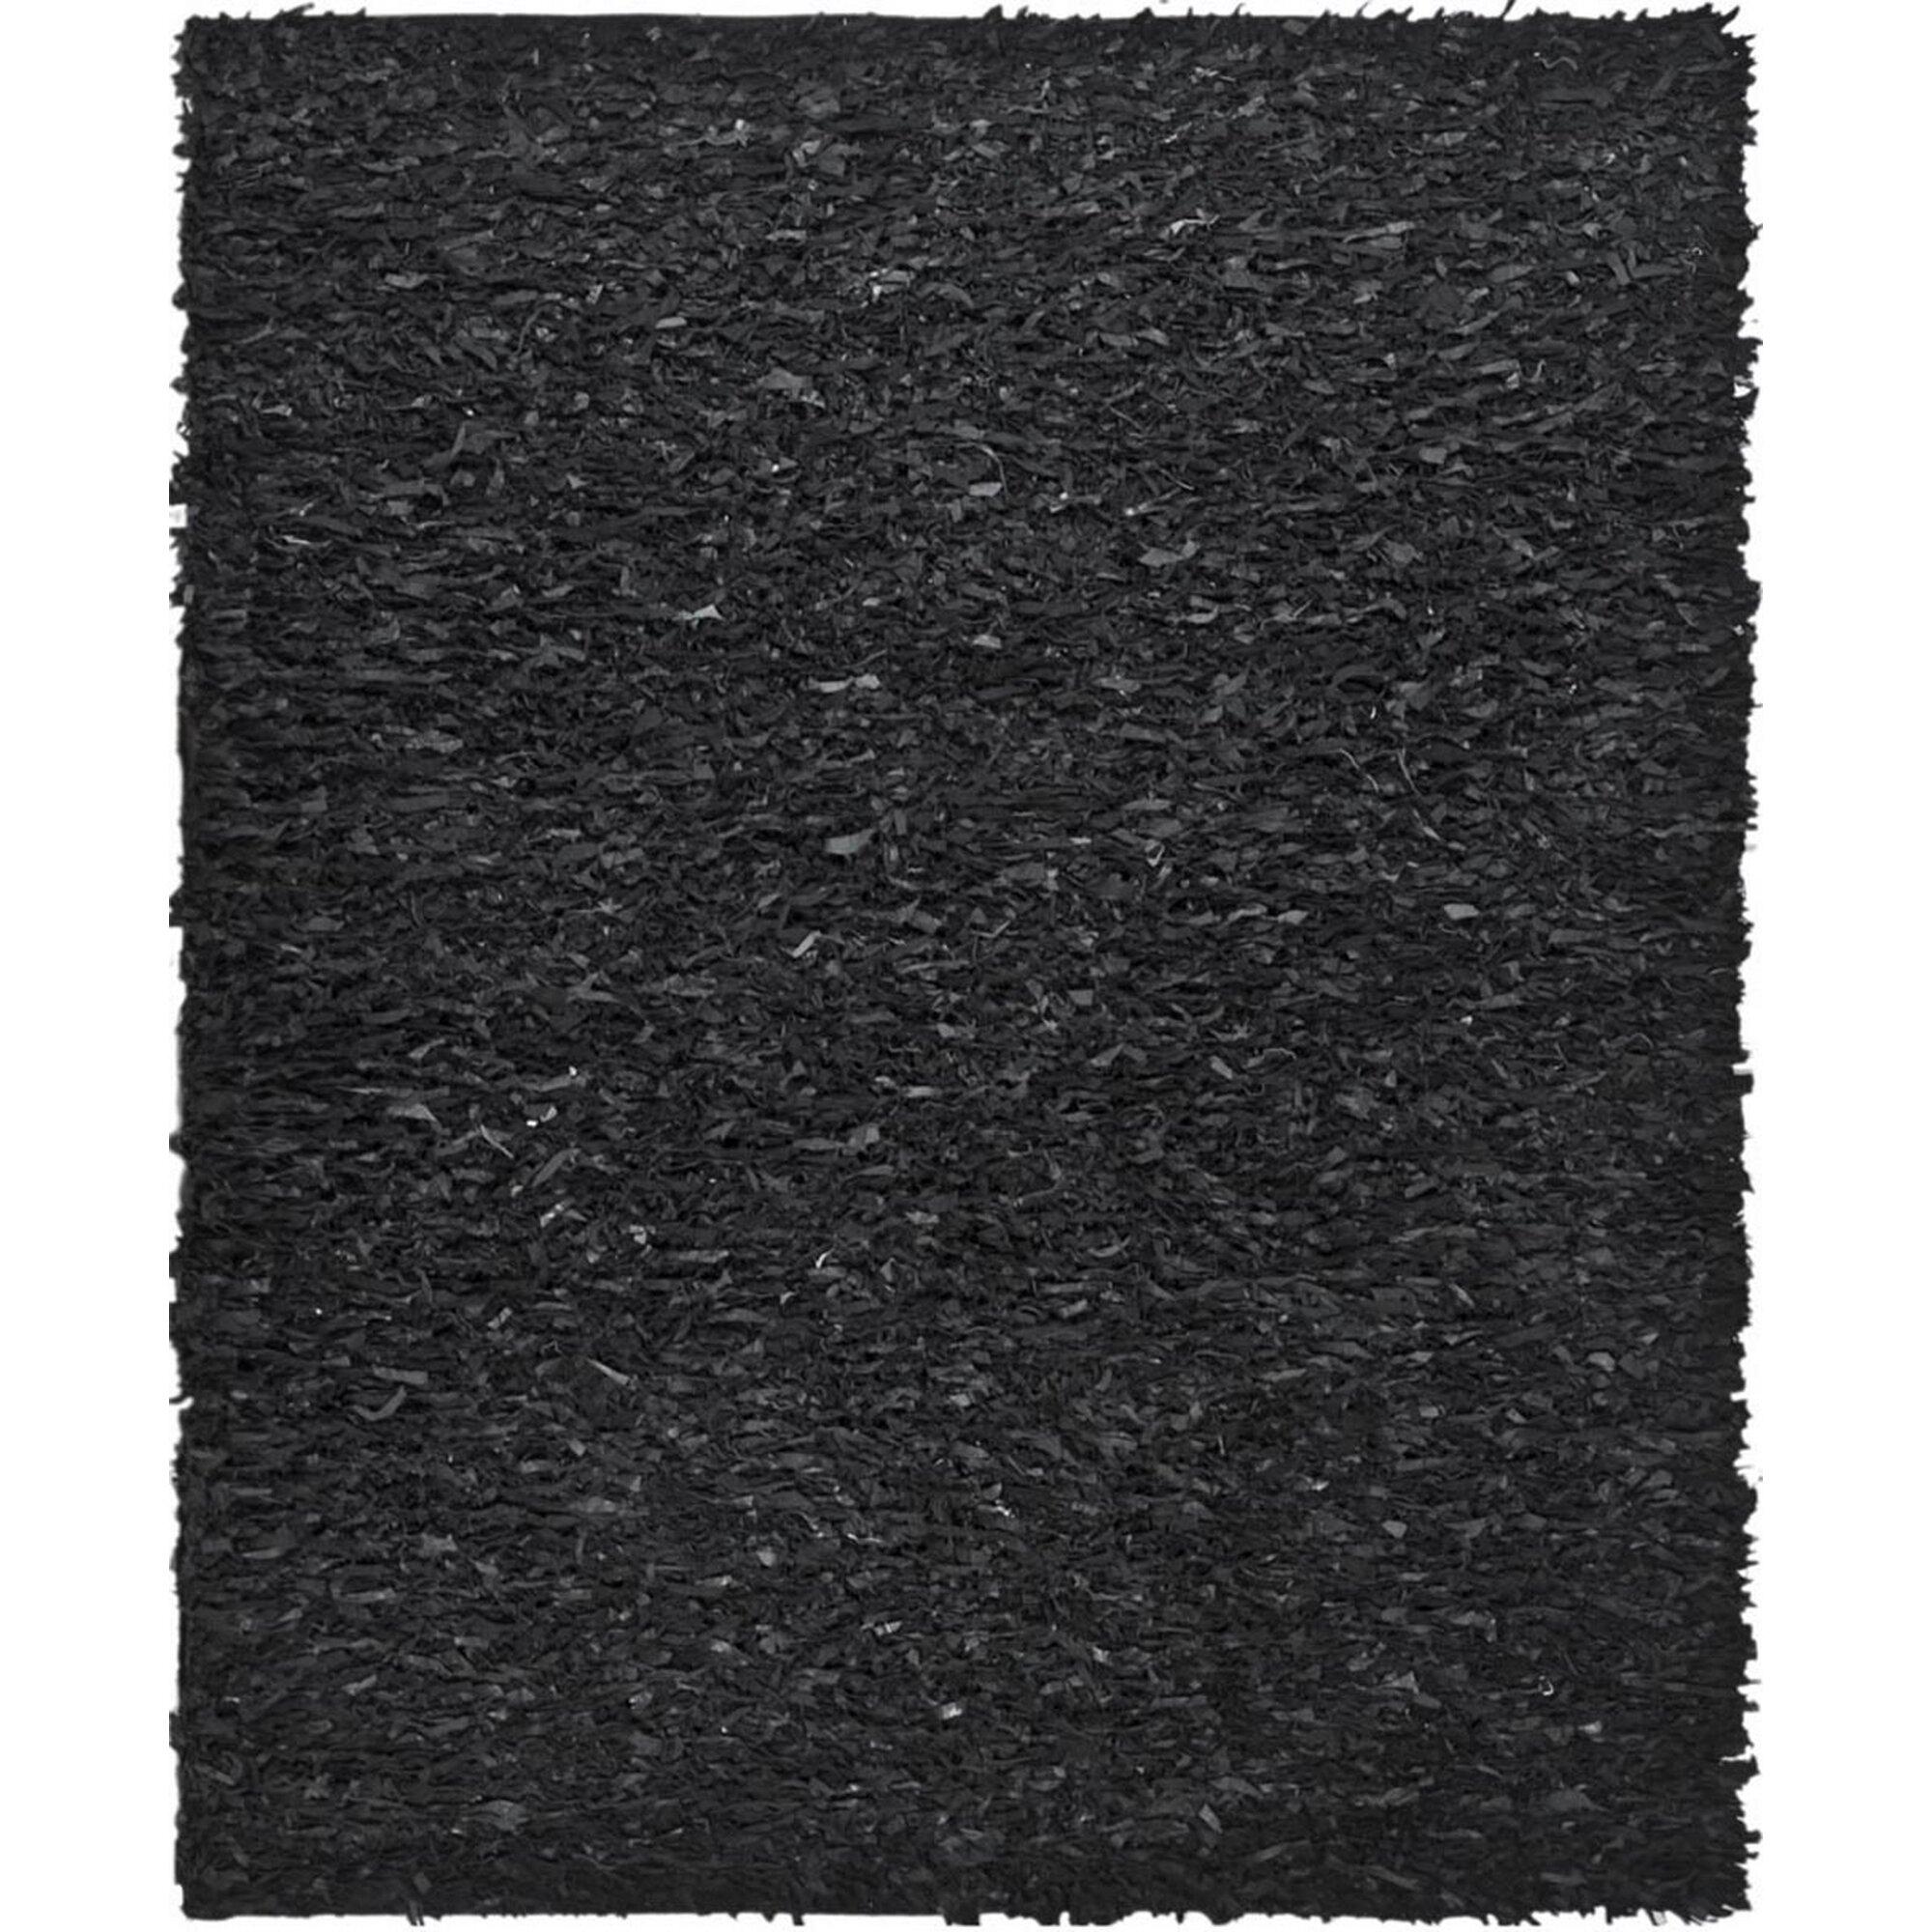 Safavieh Leather Shag Black Area Rug I Amp Reviews Wayfair